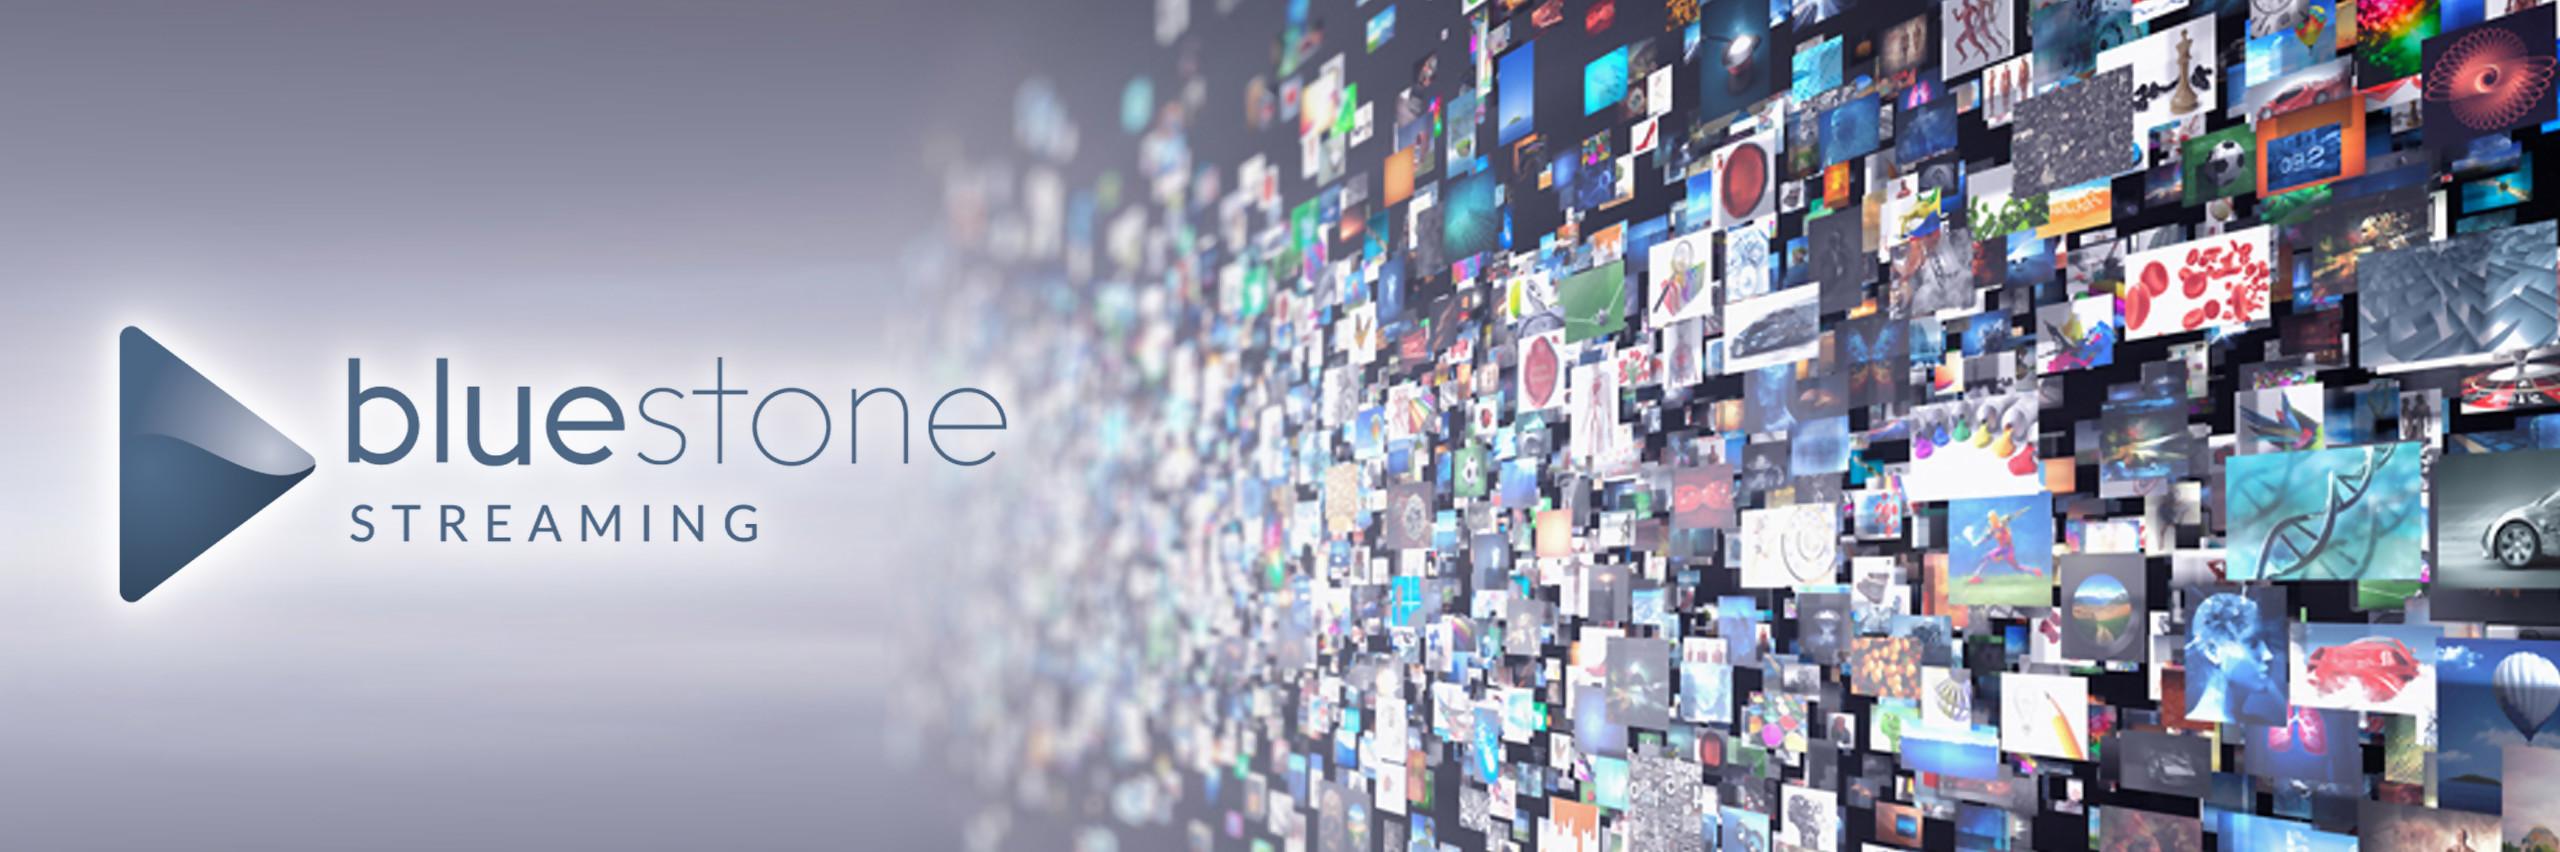 Bluestone Streaming Channel Demo